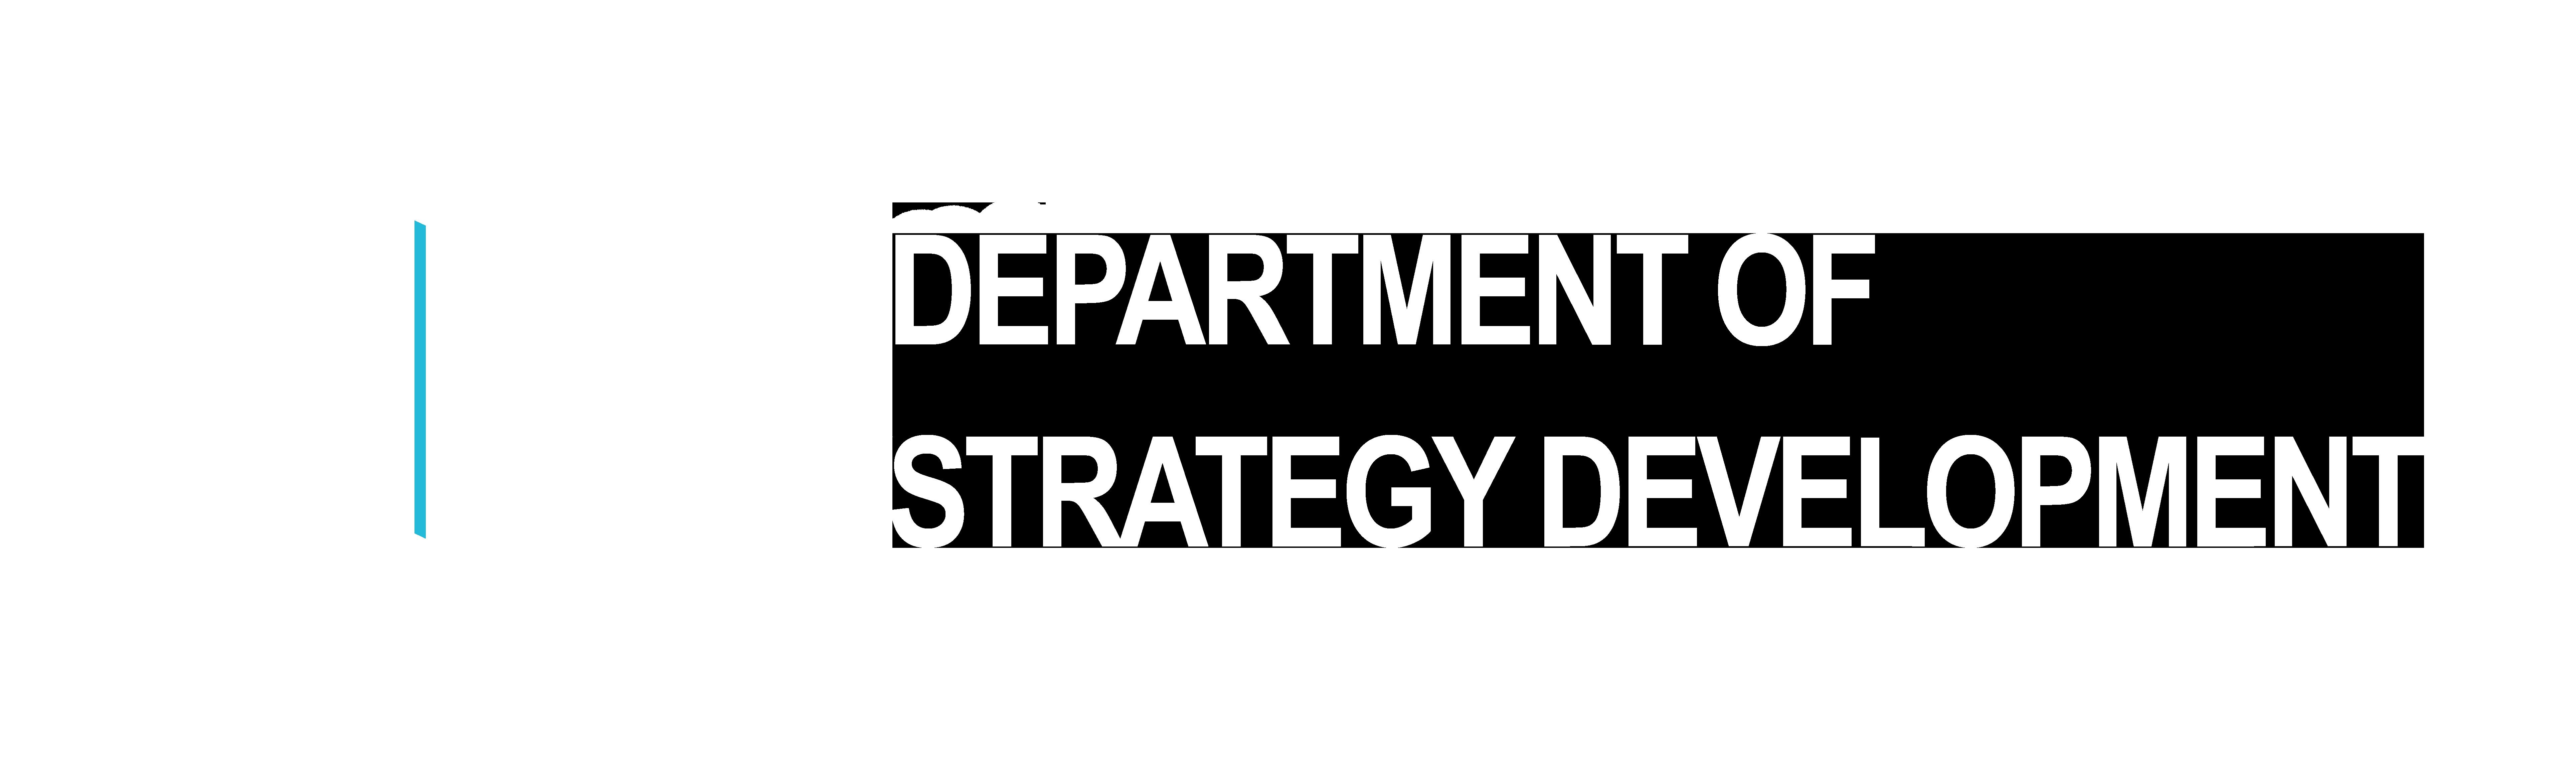 Department of Strategy Development